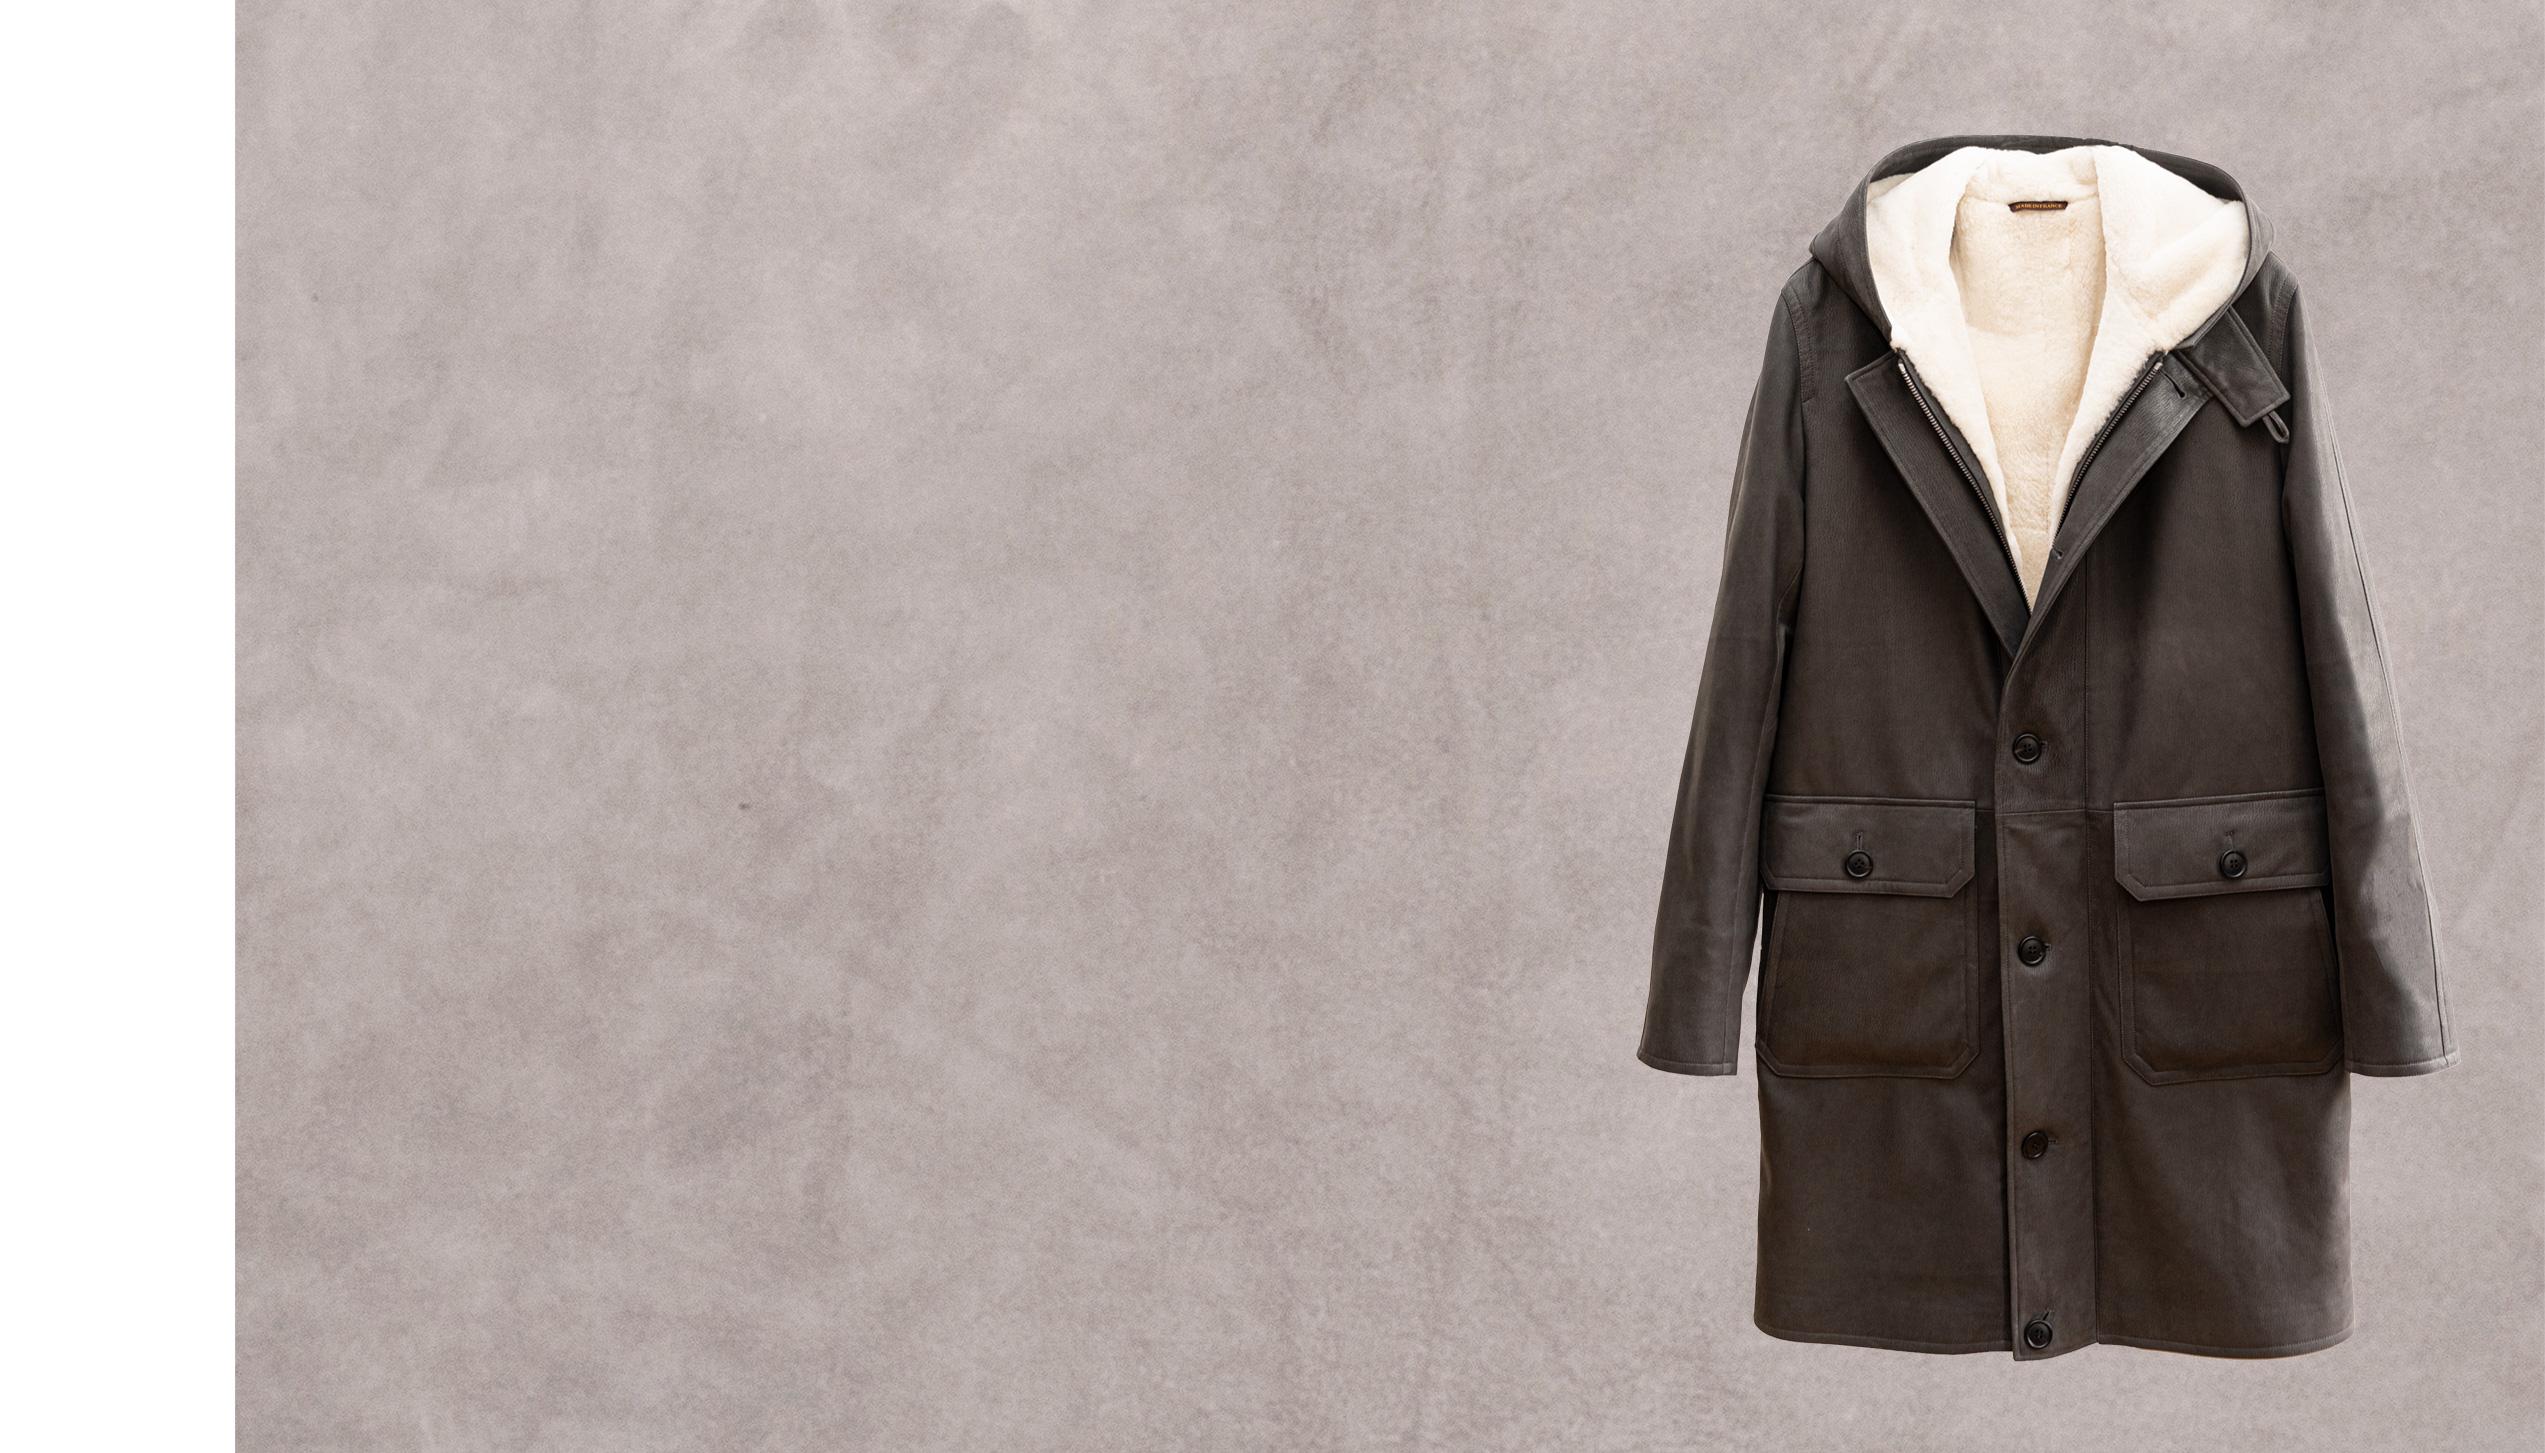 Bronx – Grey gevaudan lambskin lined with white nutria fur